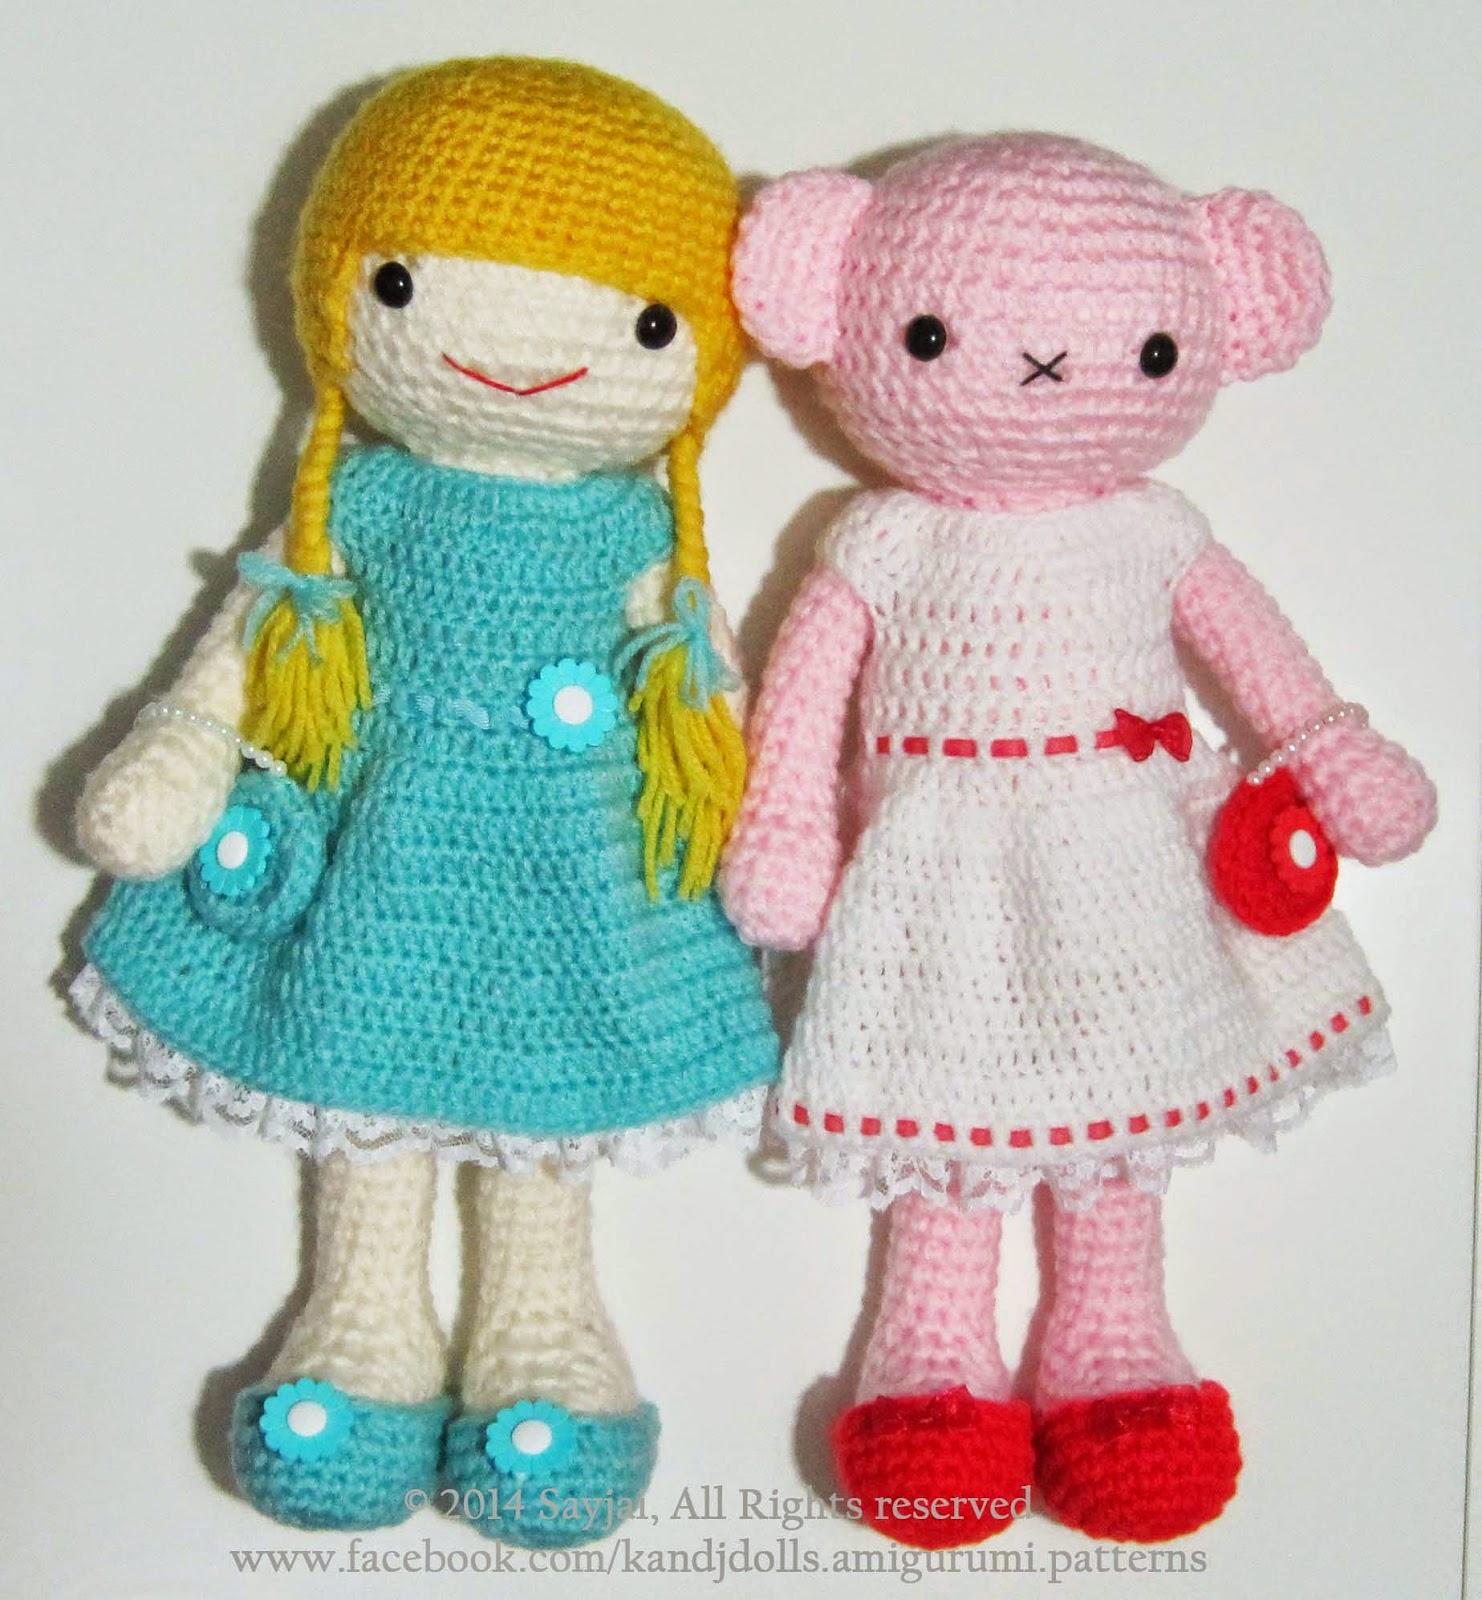 Emily, the Dress up Doll | Knitted dolls, Dress up dolls, Crochet doll  pattern | 1600x1482